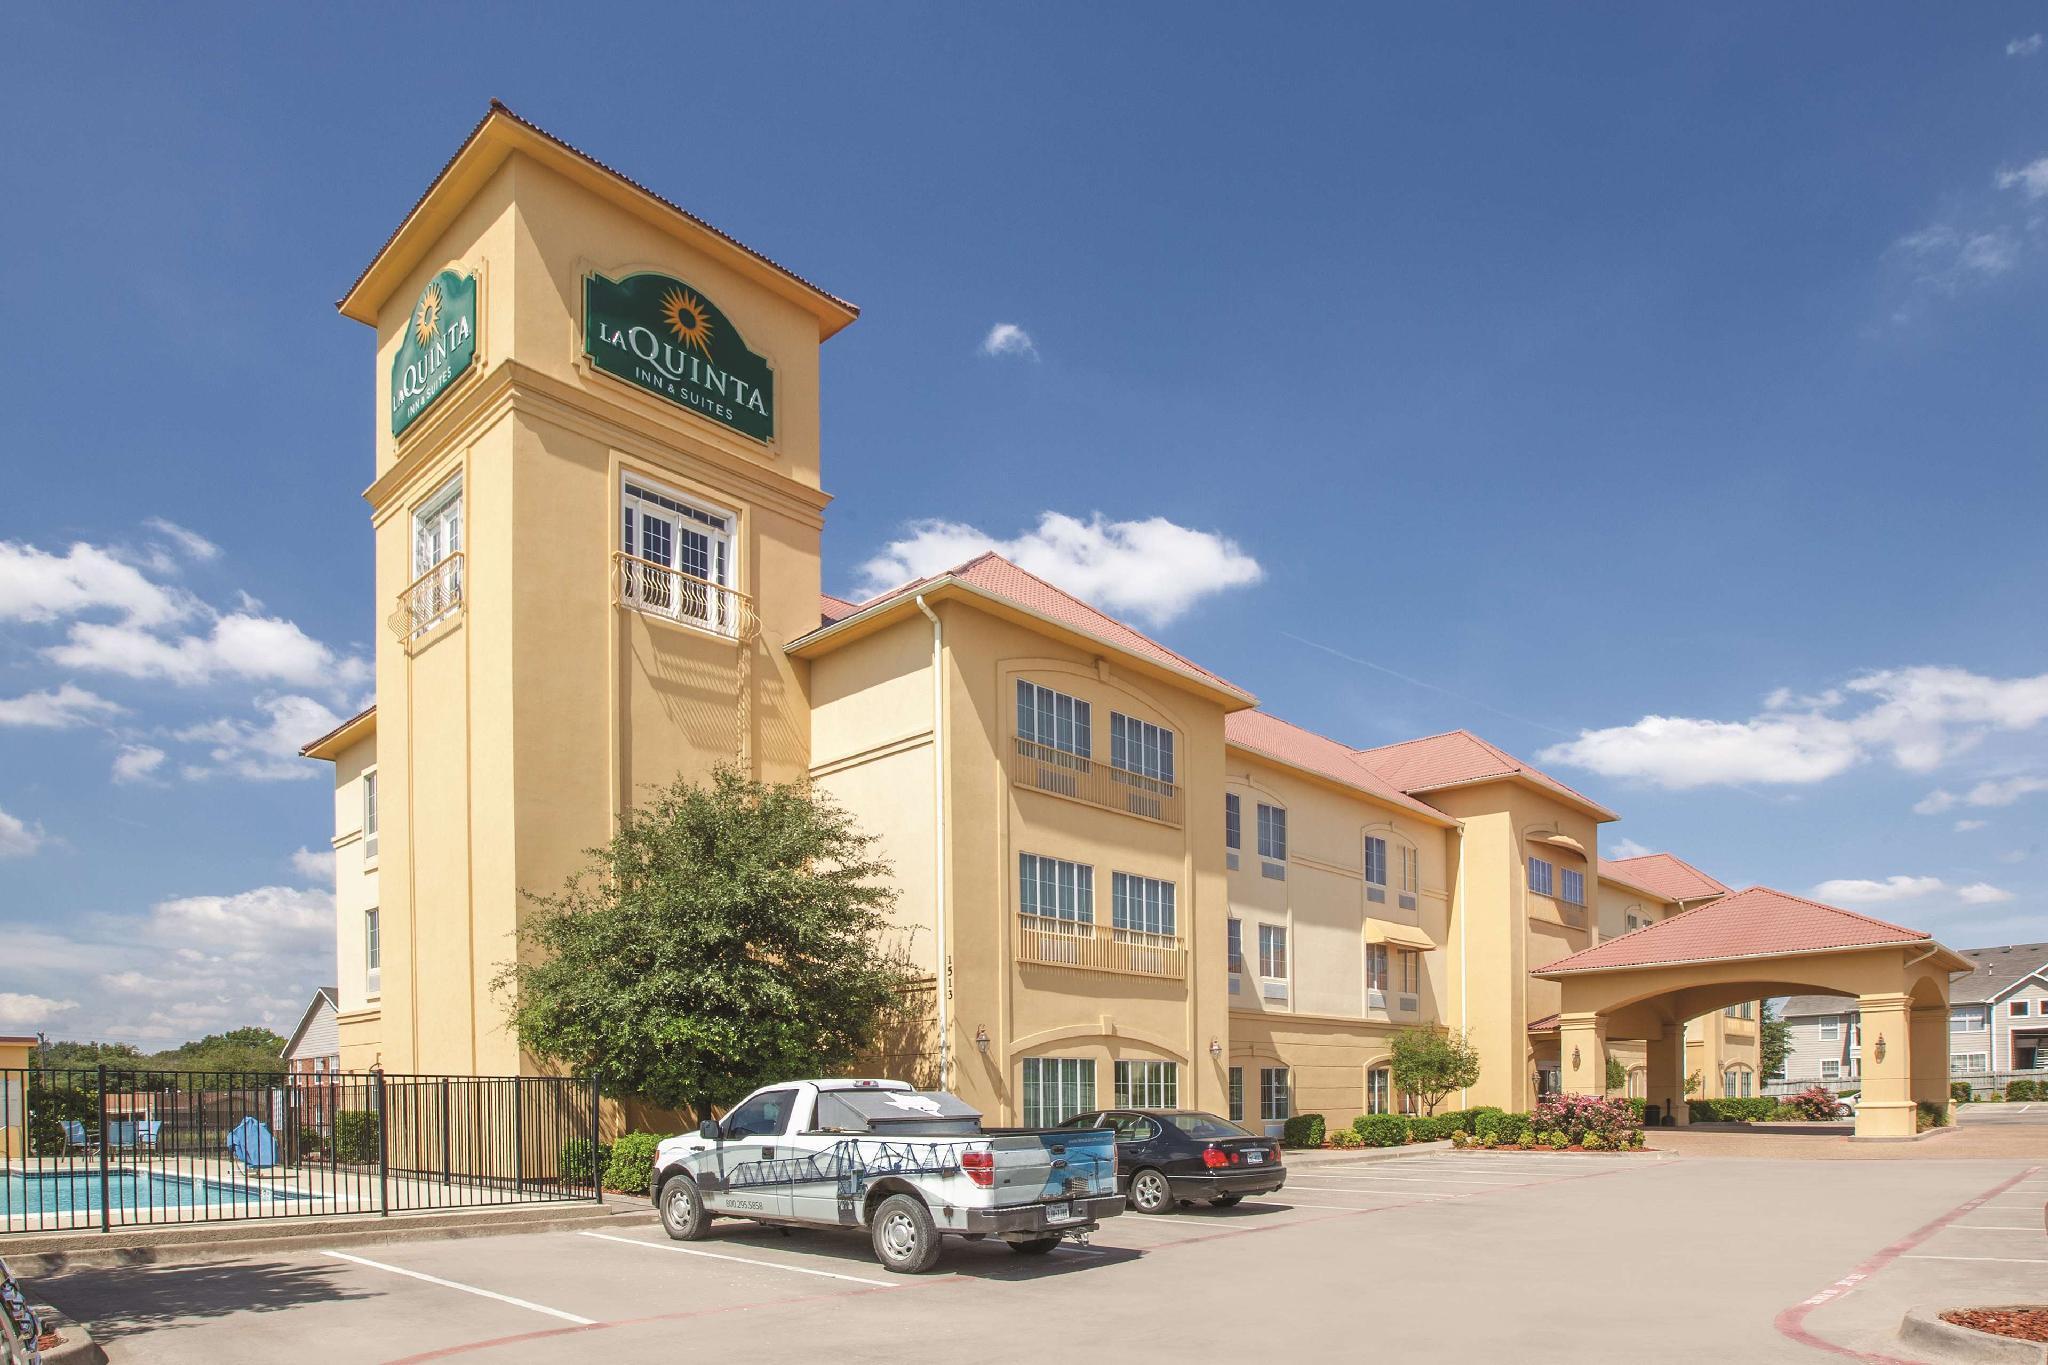 La Quinta Inn And Suites By Wyndham Hillsboro